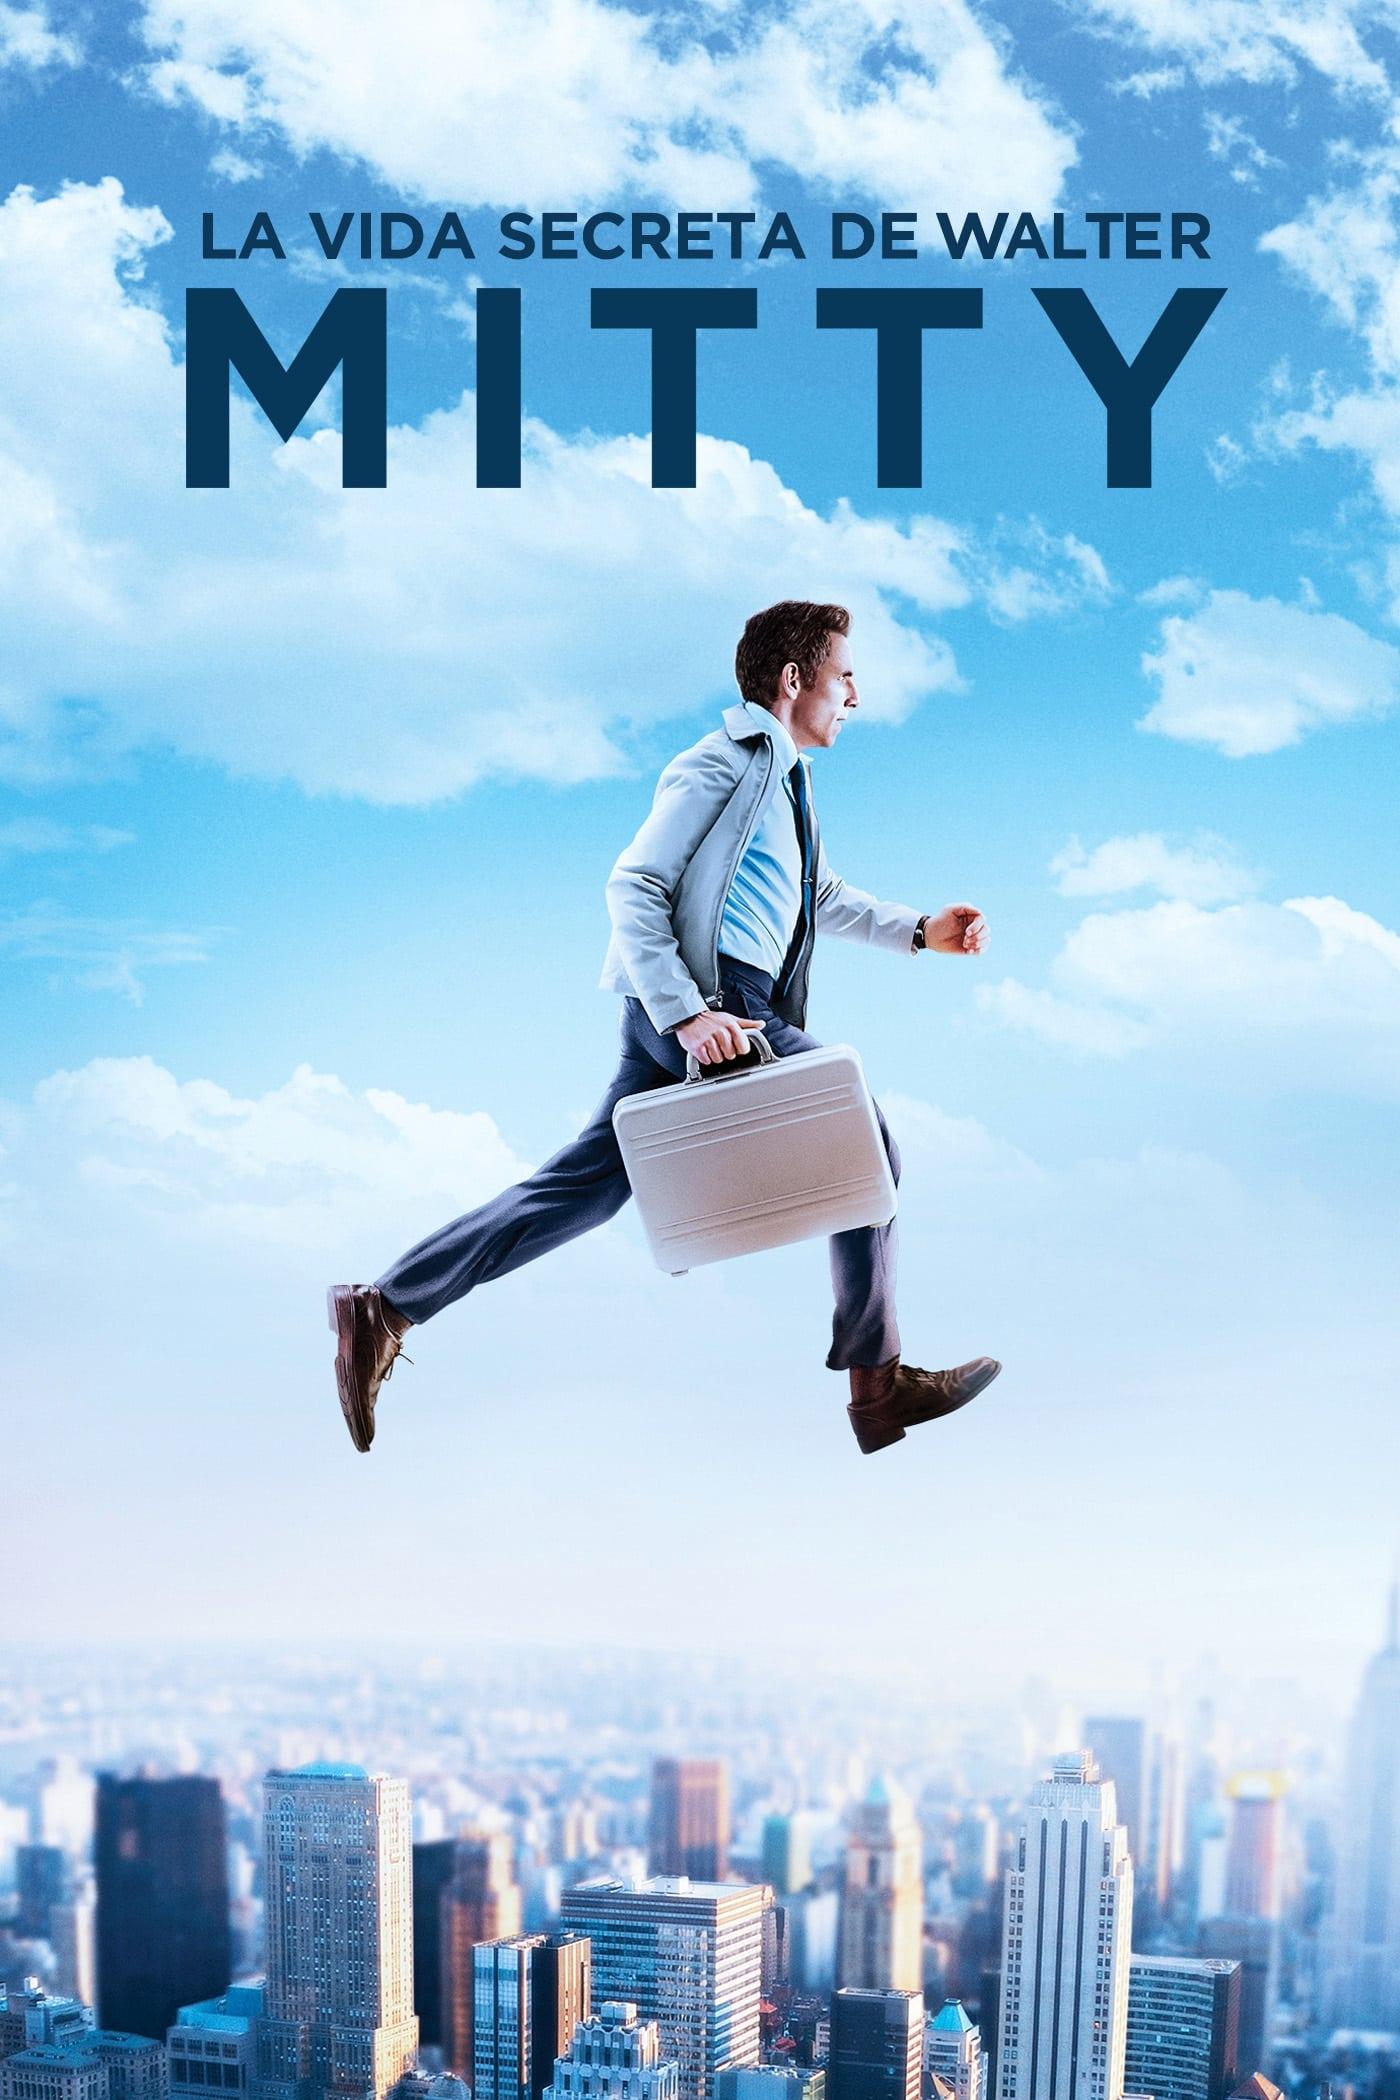 La vida secreta de Walter Mitty poster